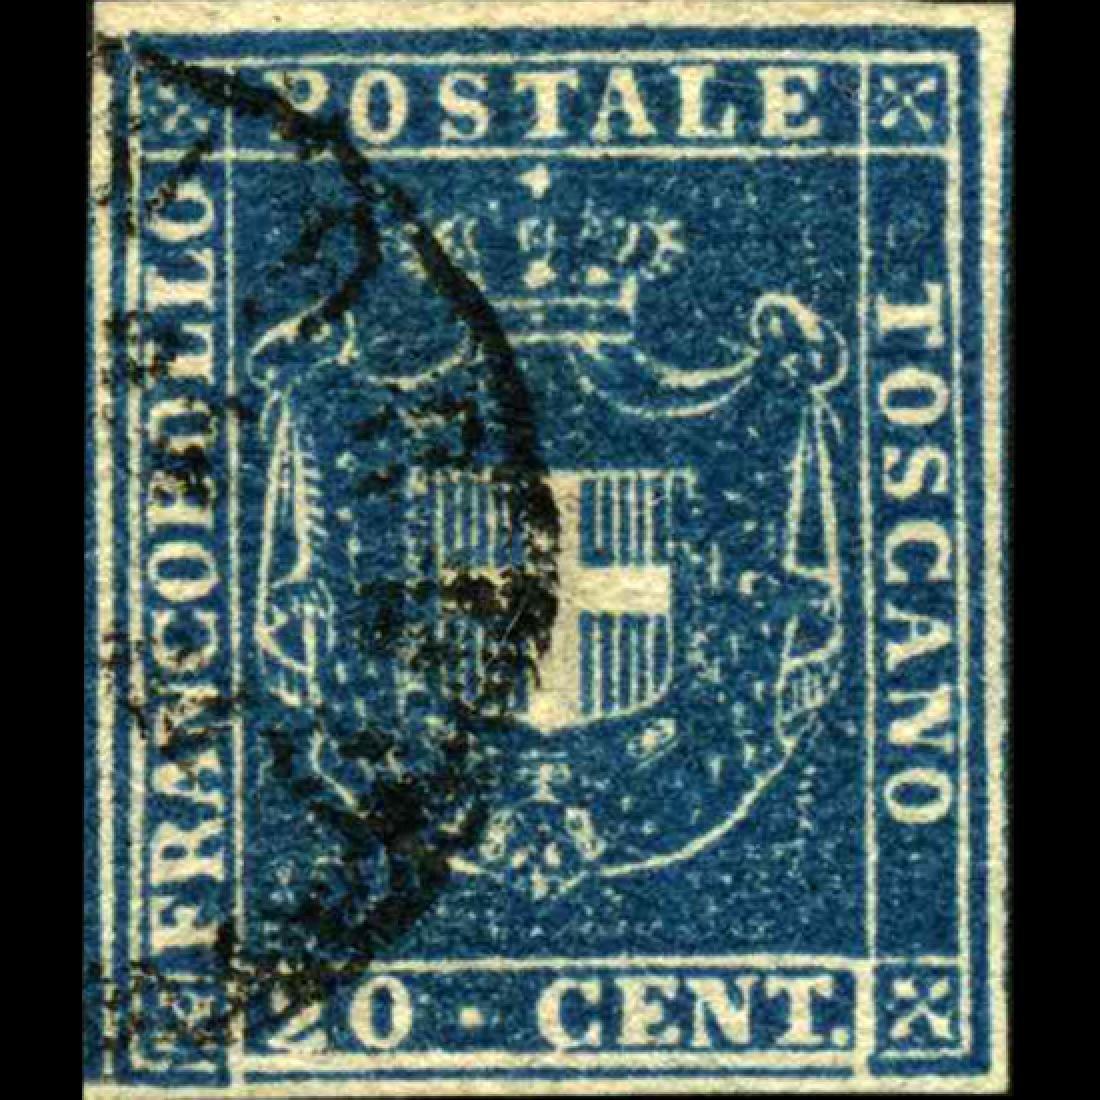 1860 Tuscany 20c Stamp